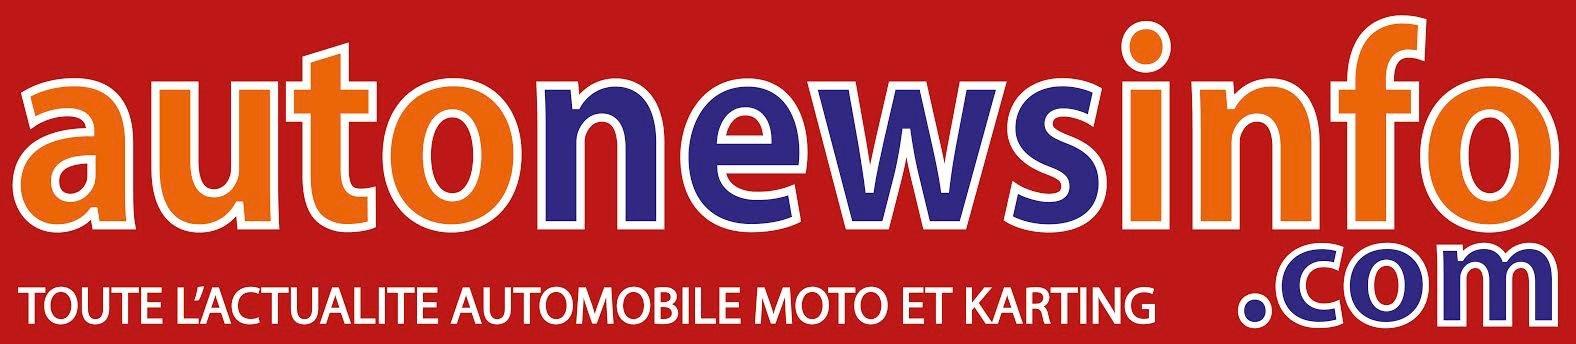 autonewsinfo